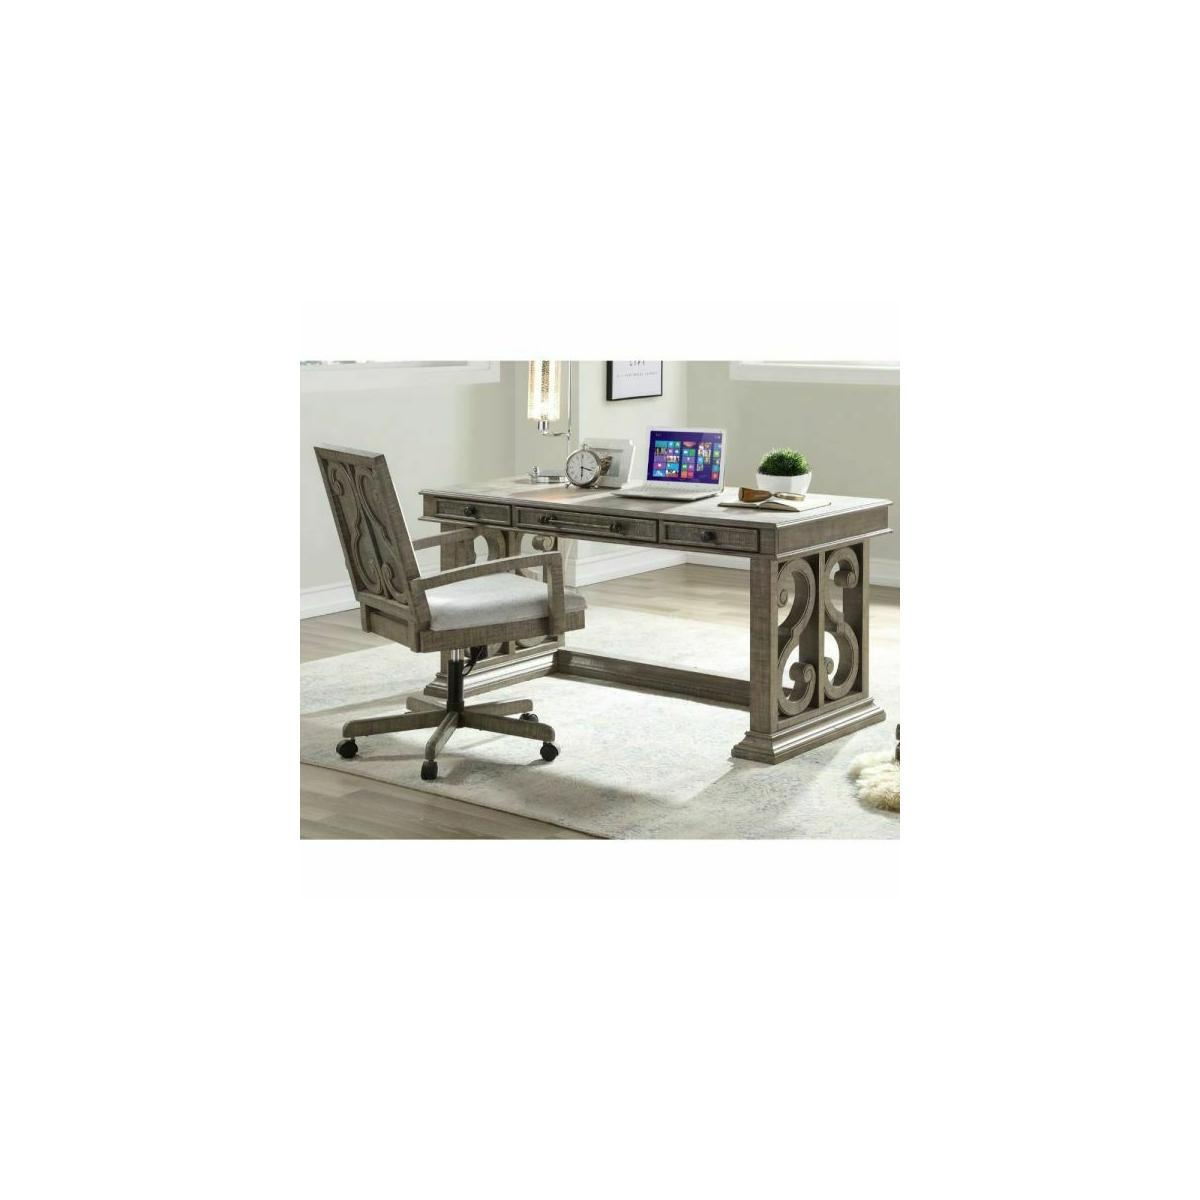 ACME Artesia Executive Desk - 92318 - Salvaged Natural